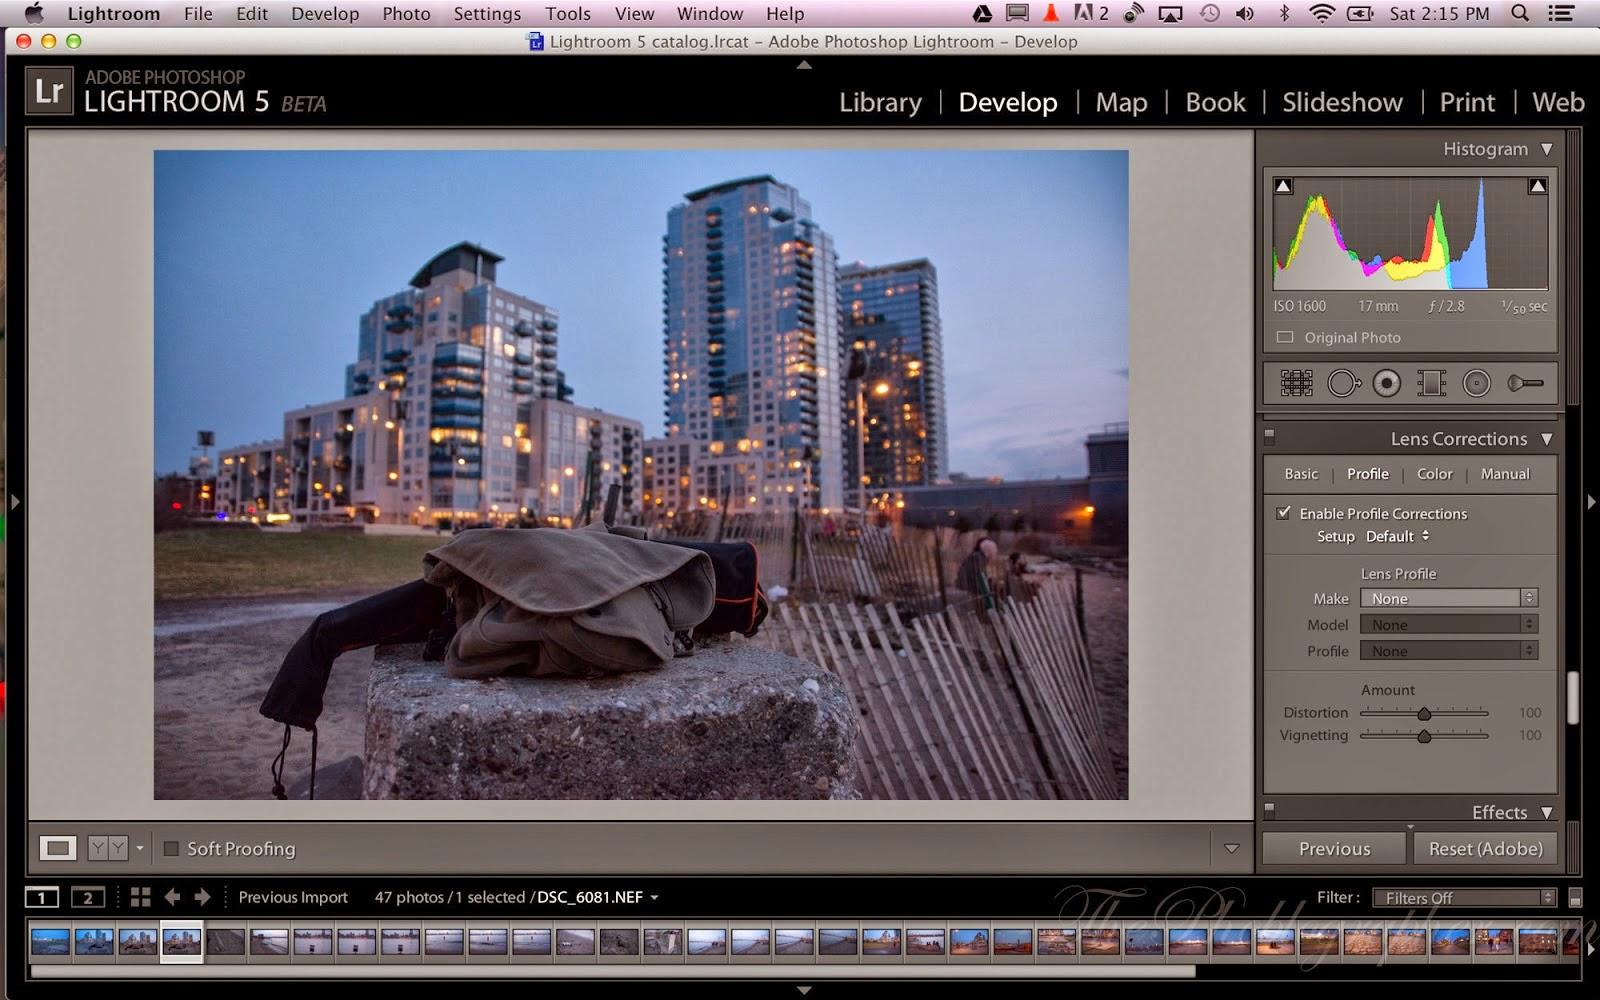 Adobe Photoshop CC free full version